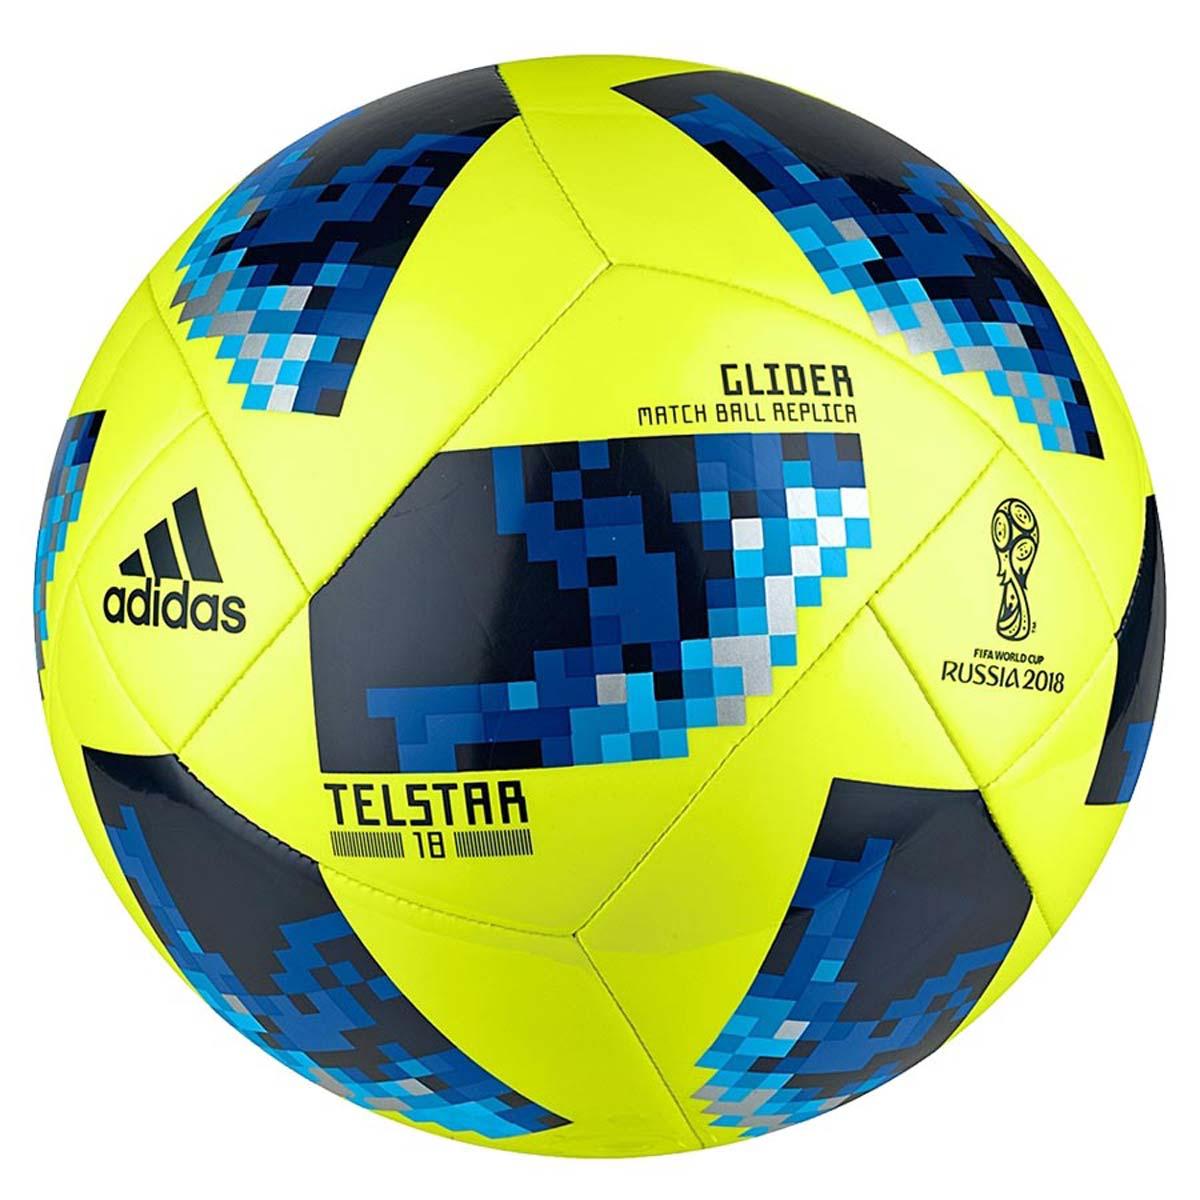 Buy Adidas FIFA World Cup Glider Football Online in India 5502bb74aa